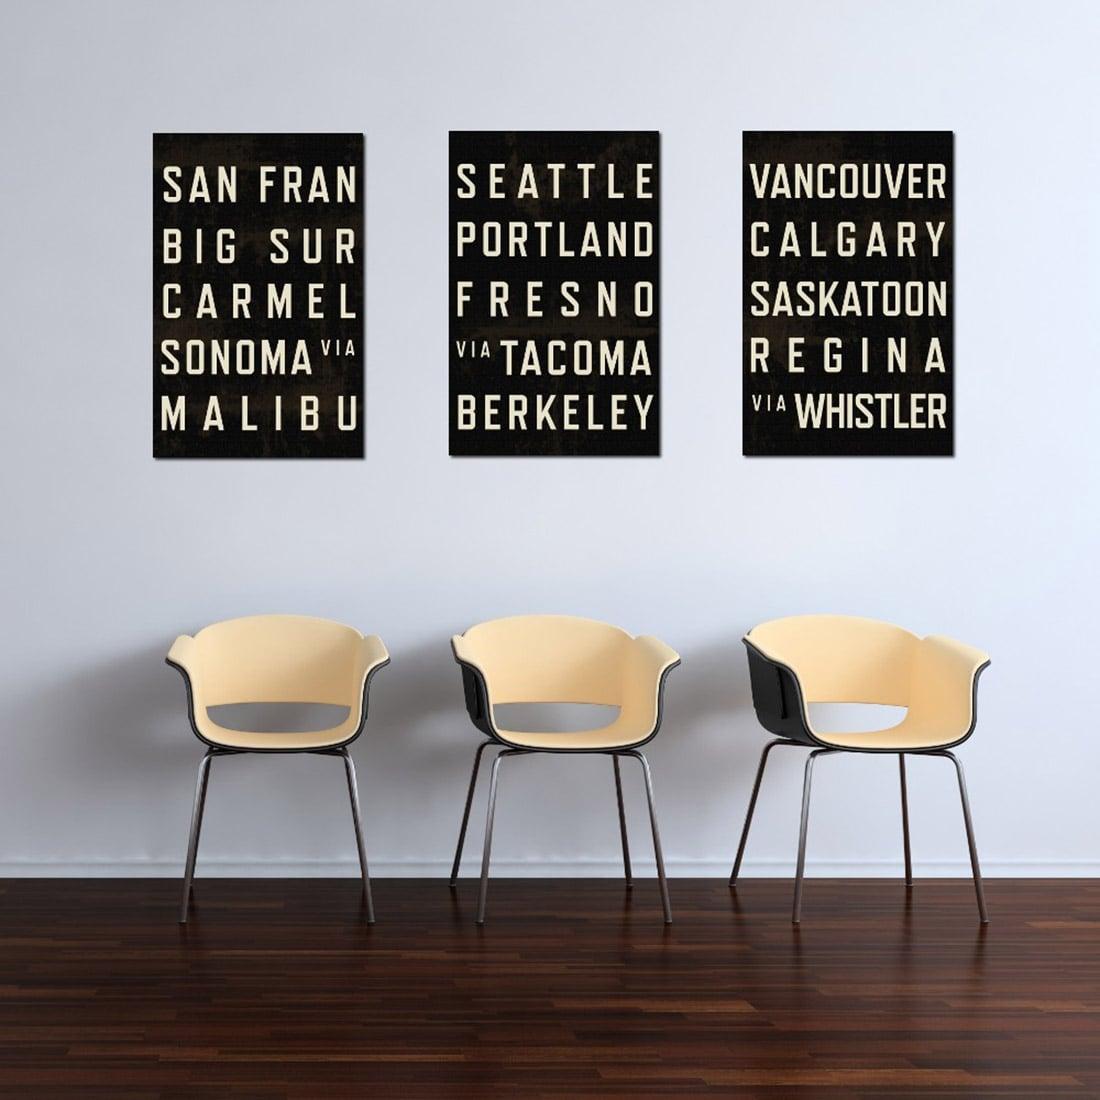 West Coast Subway Prints via Going Underground